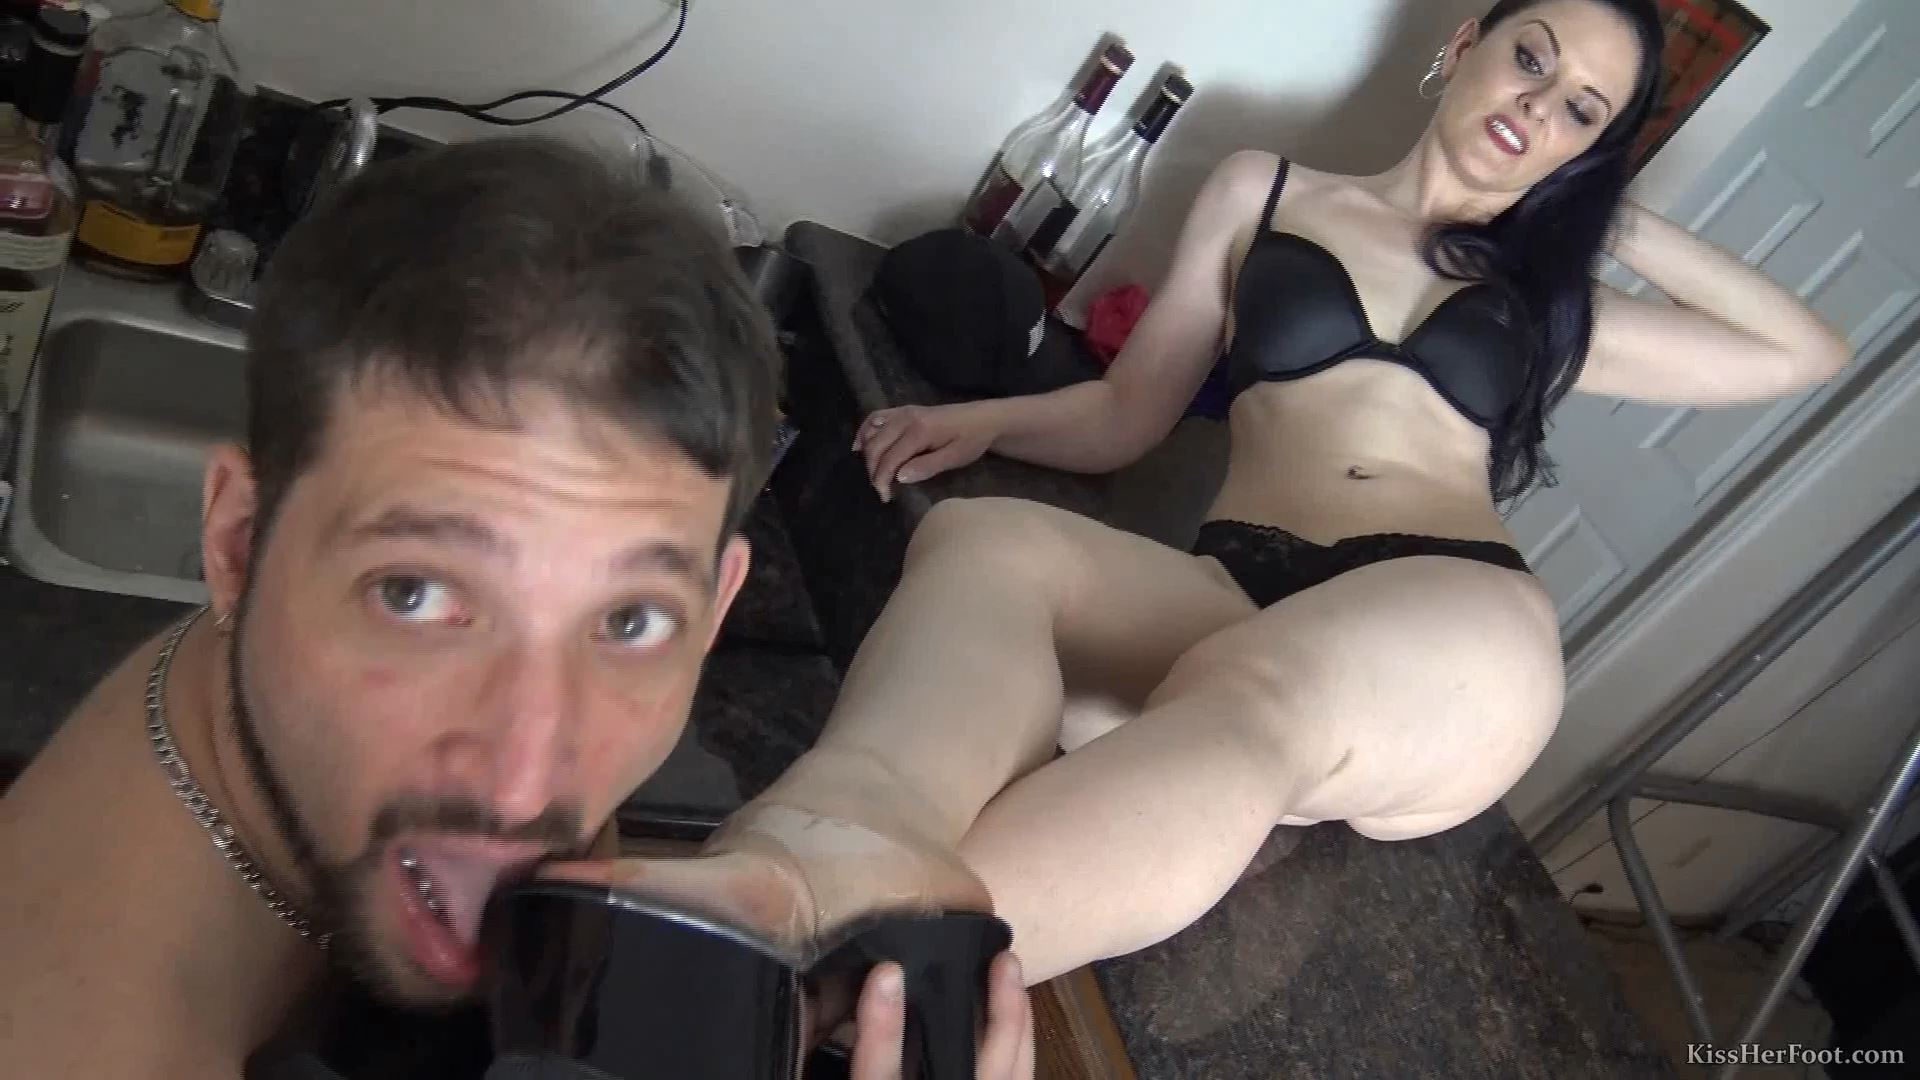 Caroline Pierce has this pervert worship her well used stripper heels - KISSHERFOOT - FULL HD/1080p/MP4